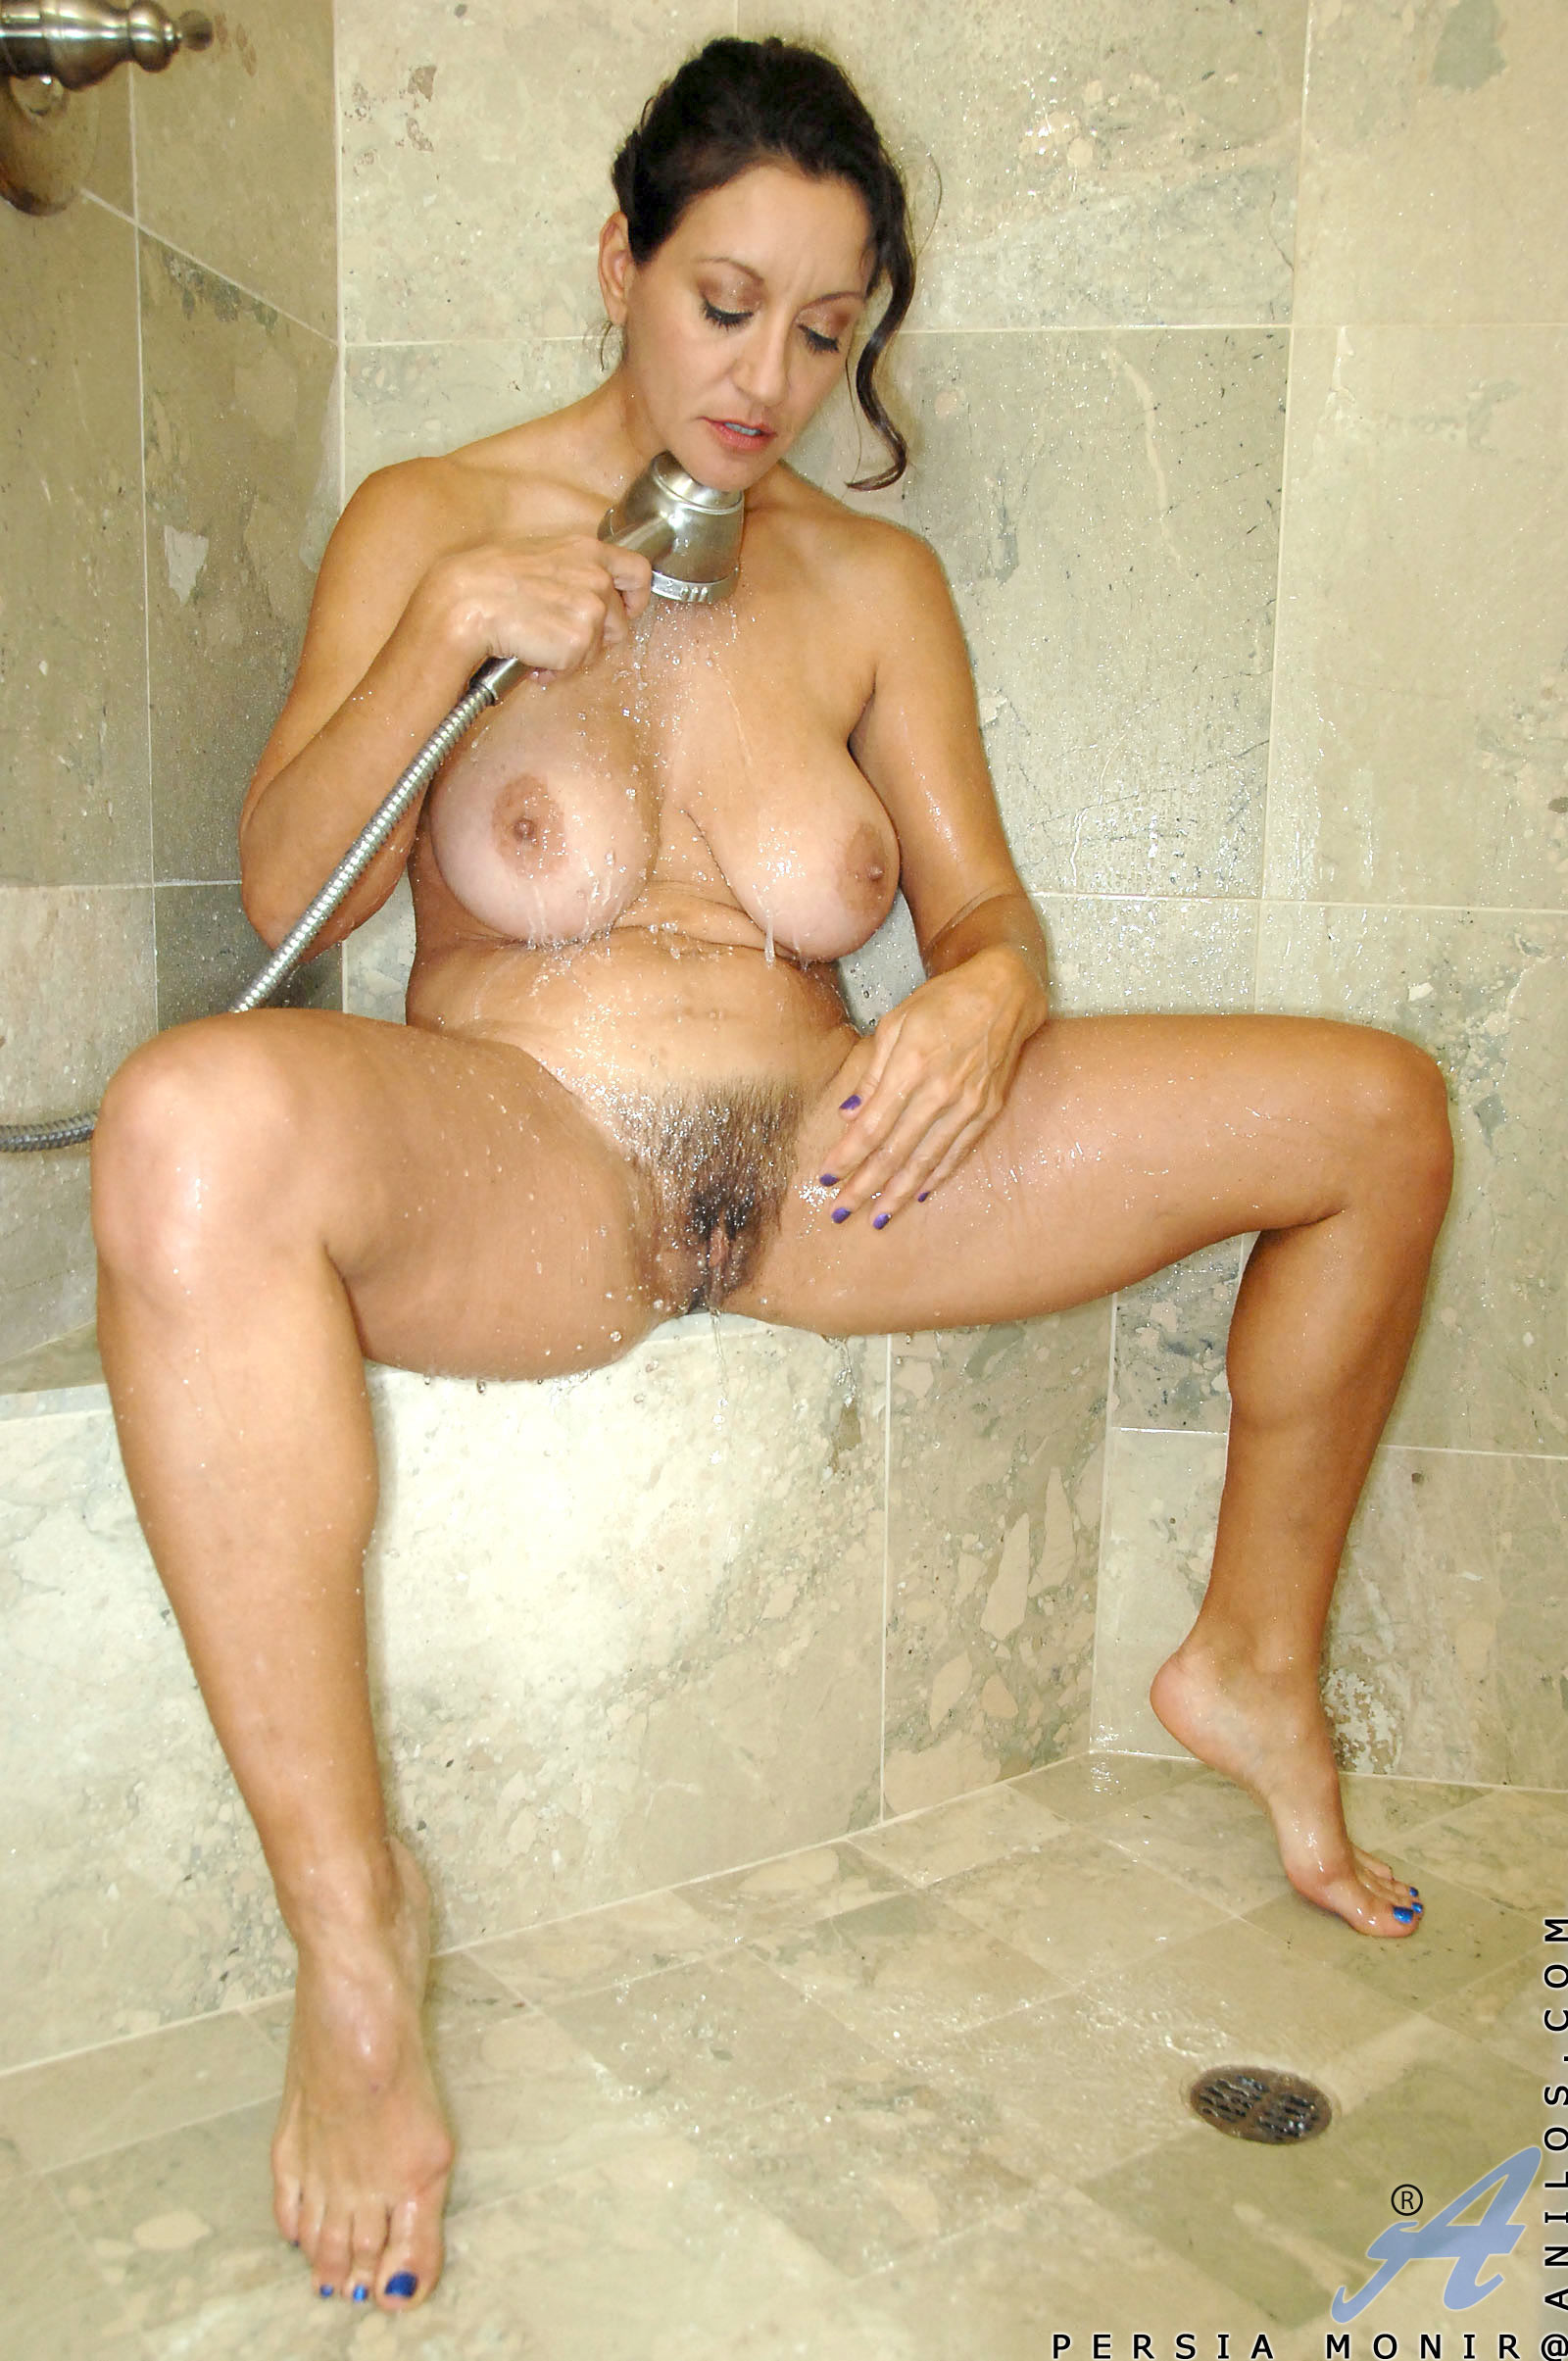 Chubby mexicana mom shower